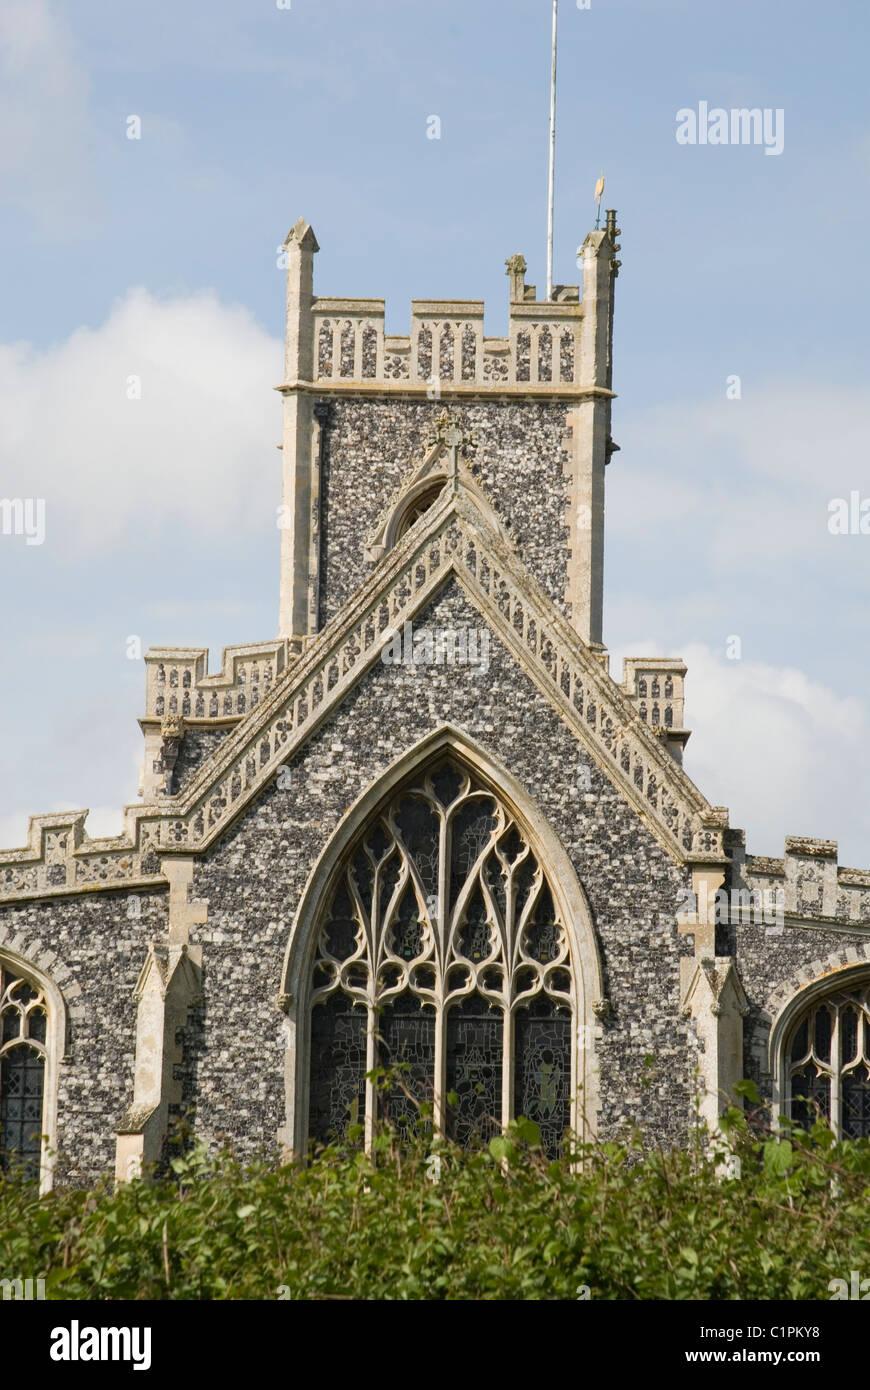 England, Suffolk, Stratford, St. Mary Church, flint faced facade - Stock Image